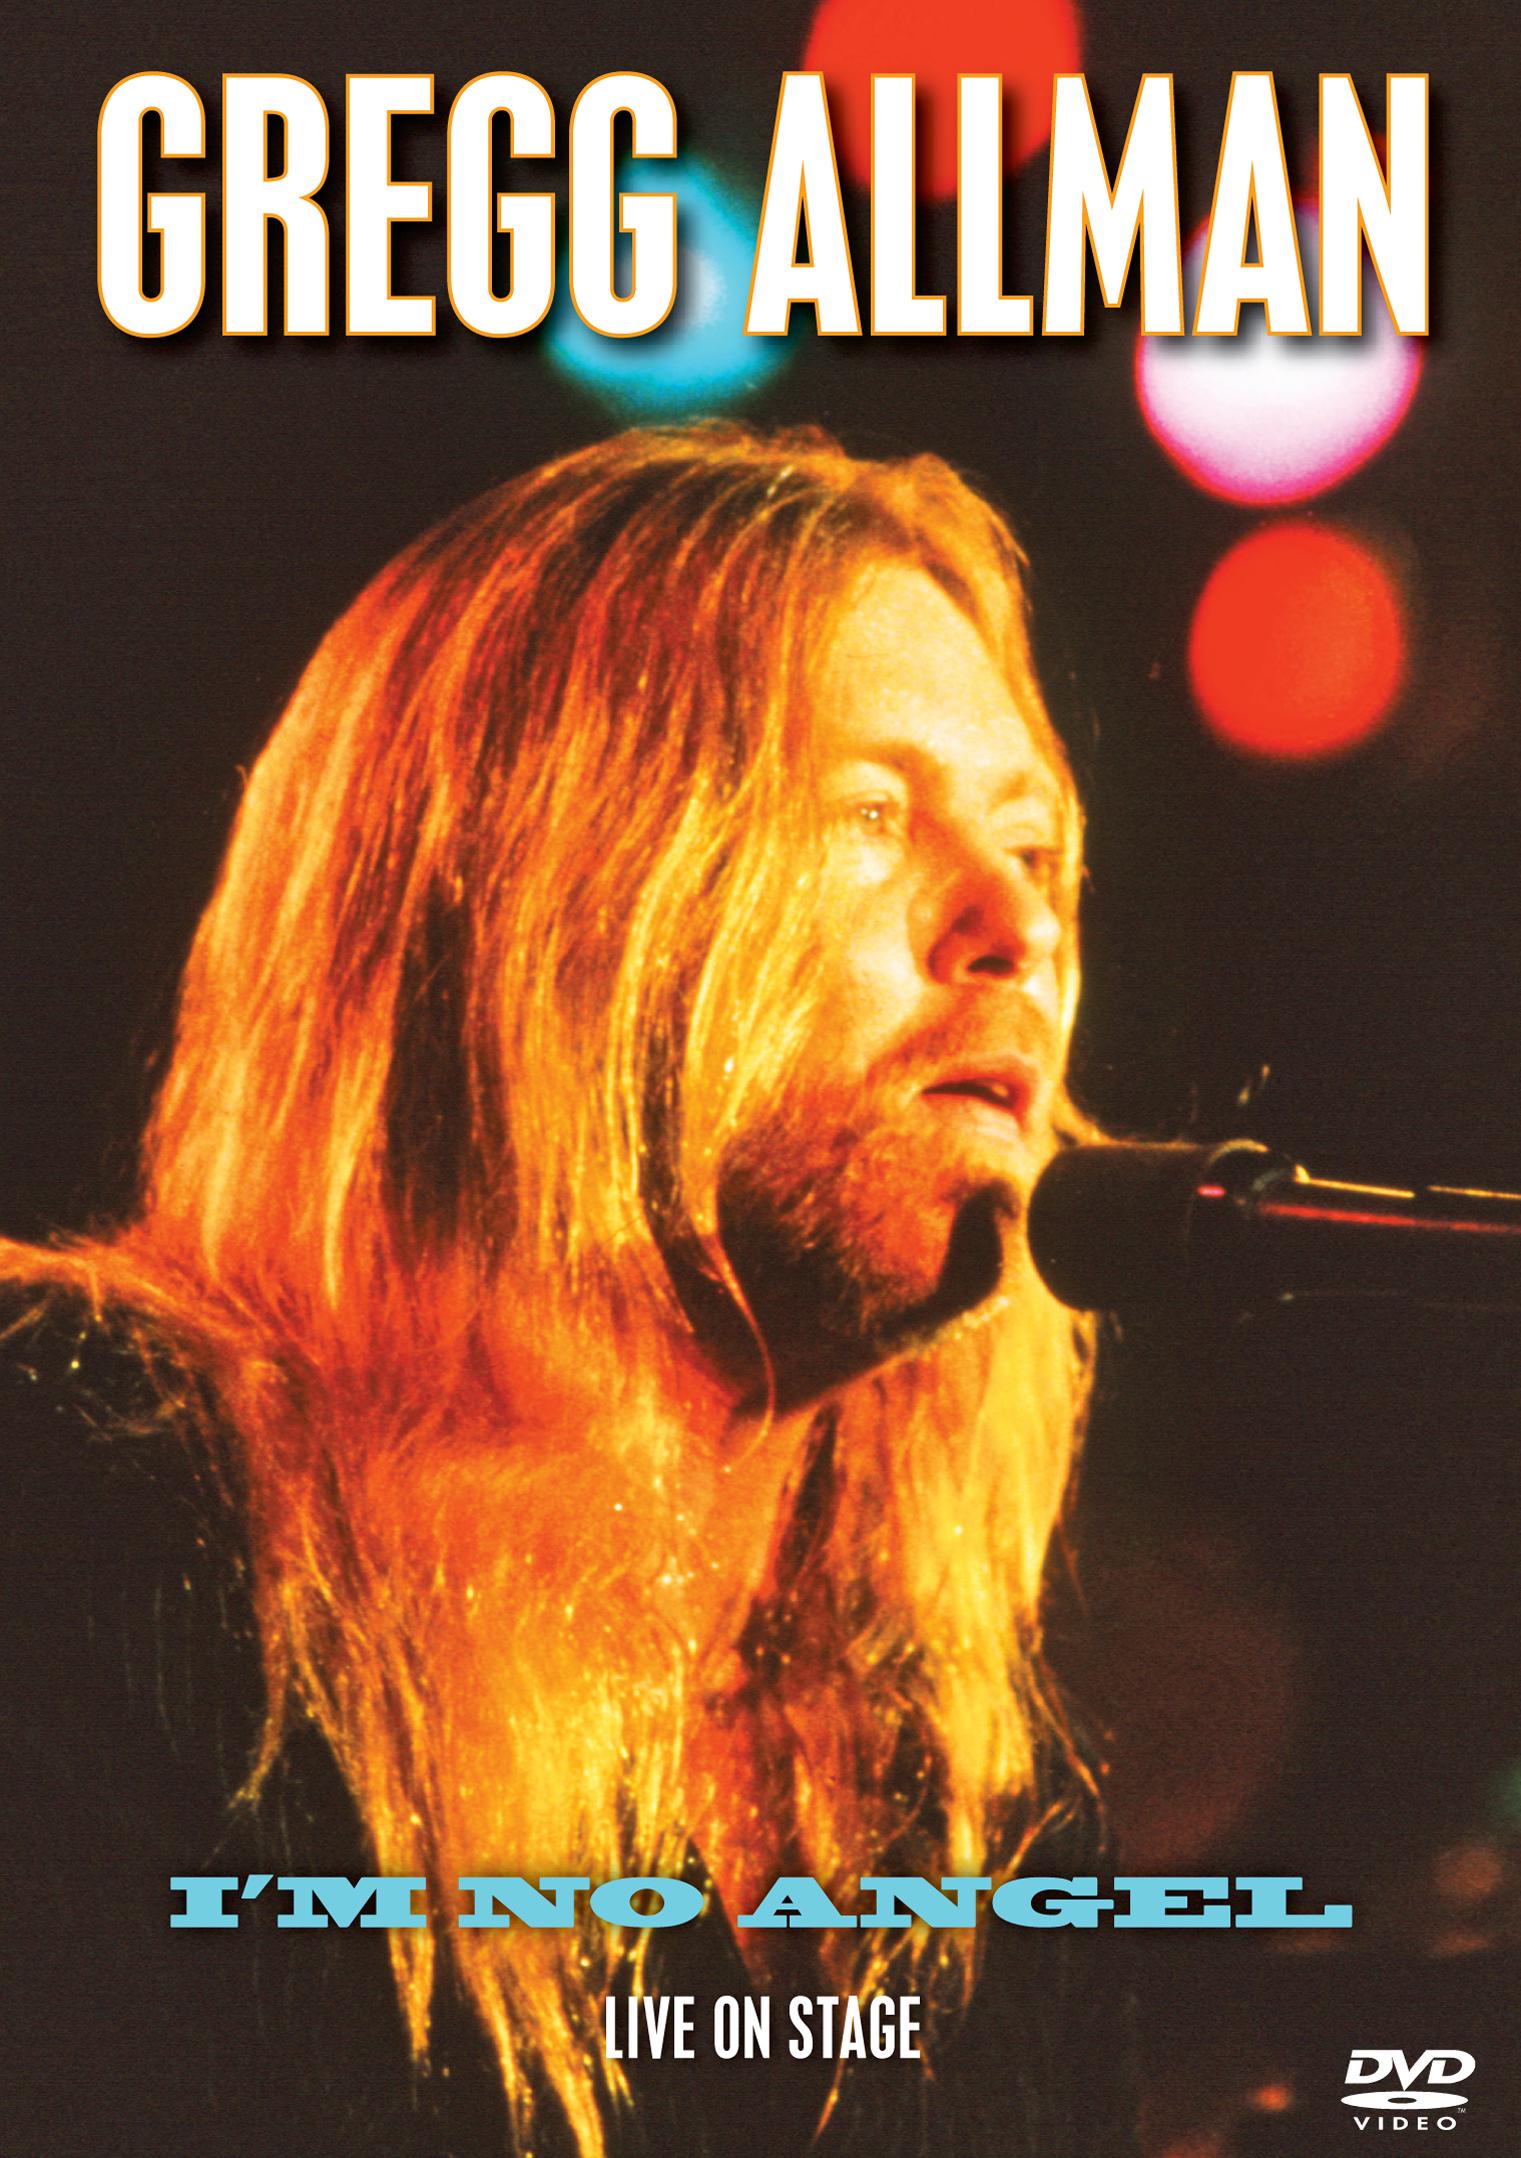 Gregg Allman: I'm No Angel - Live on Stage